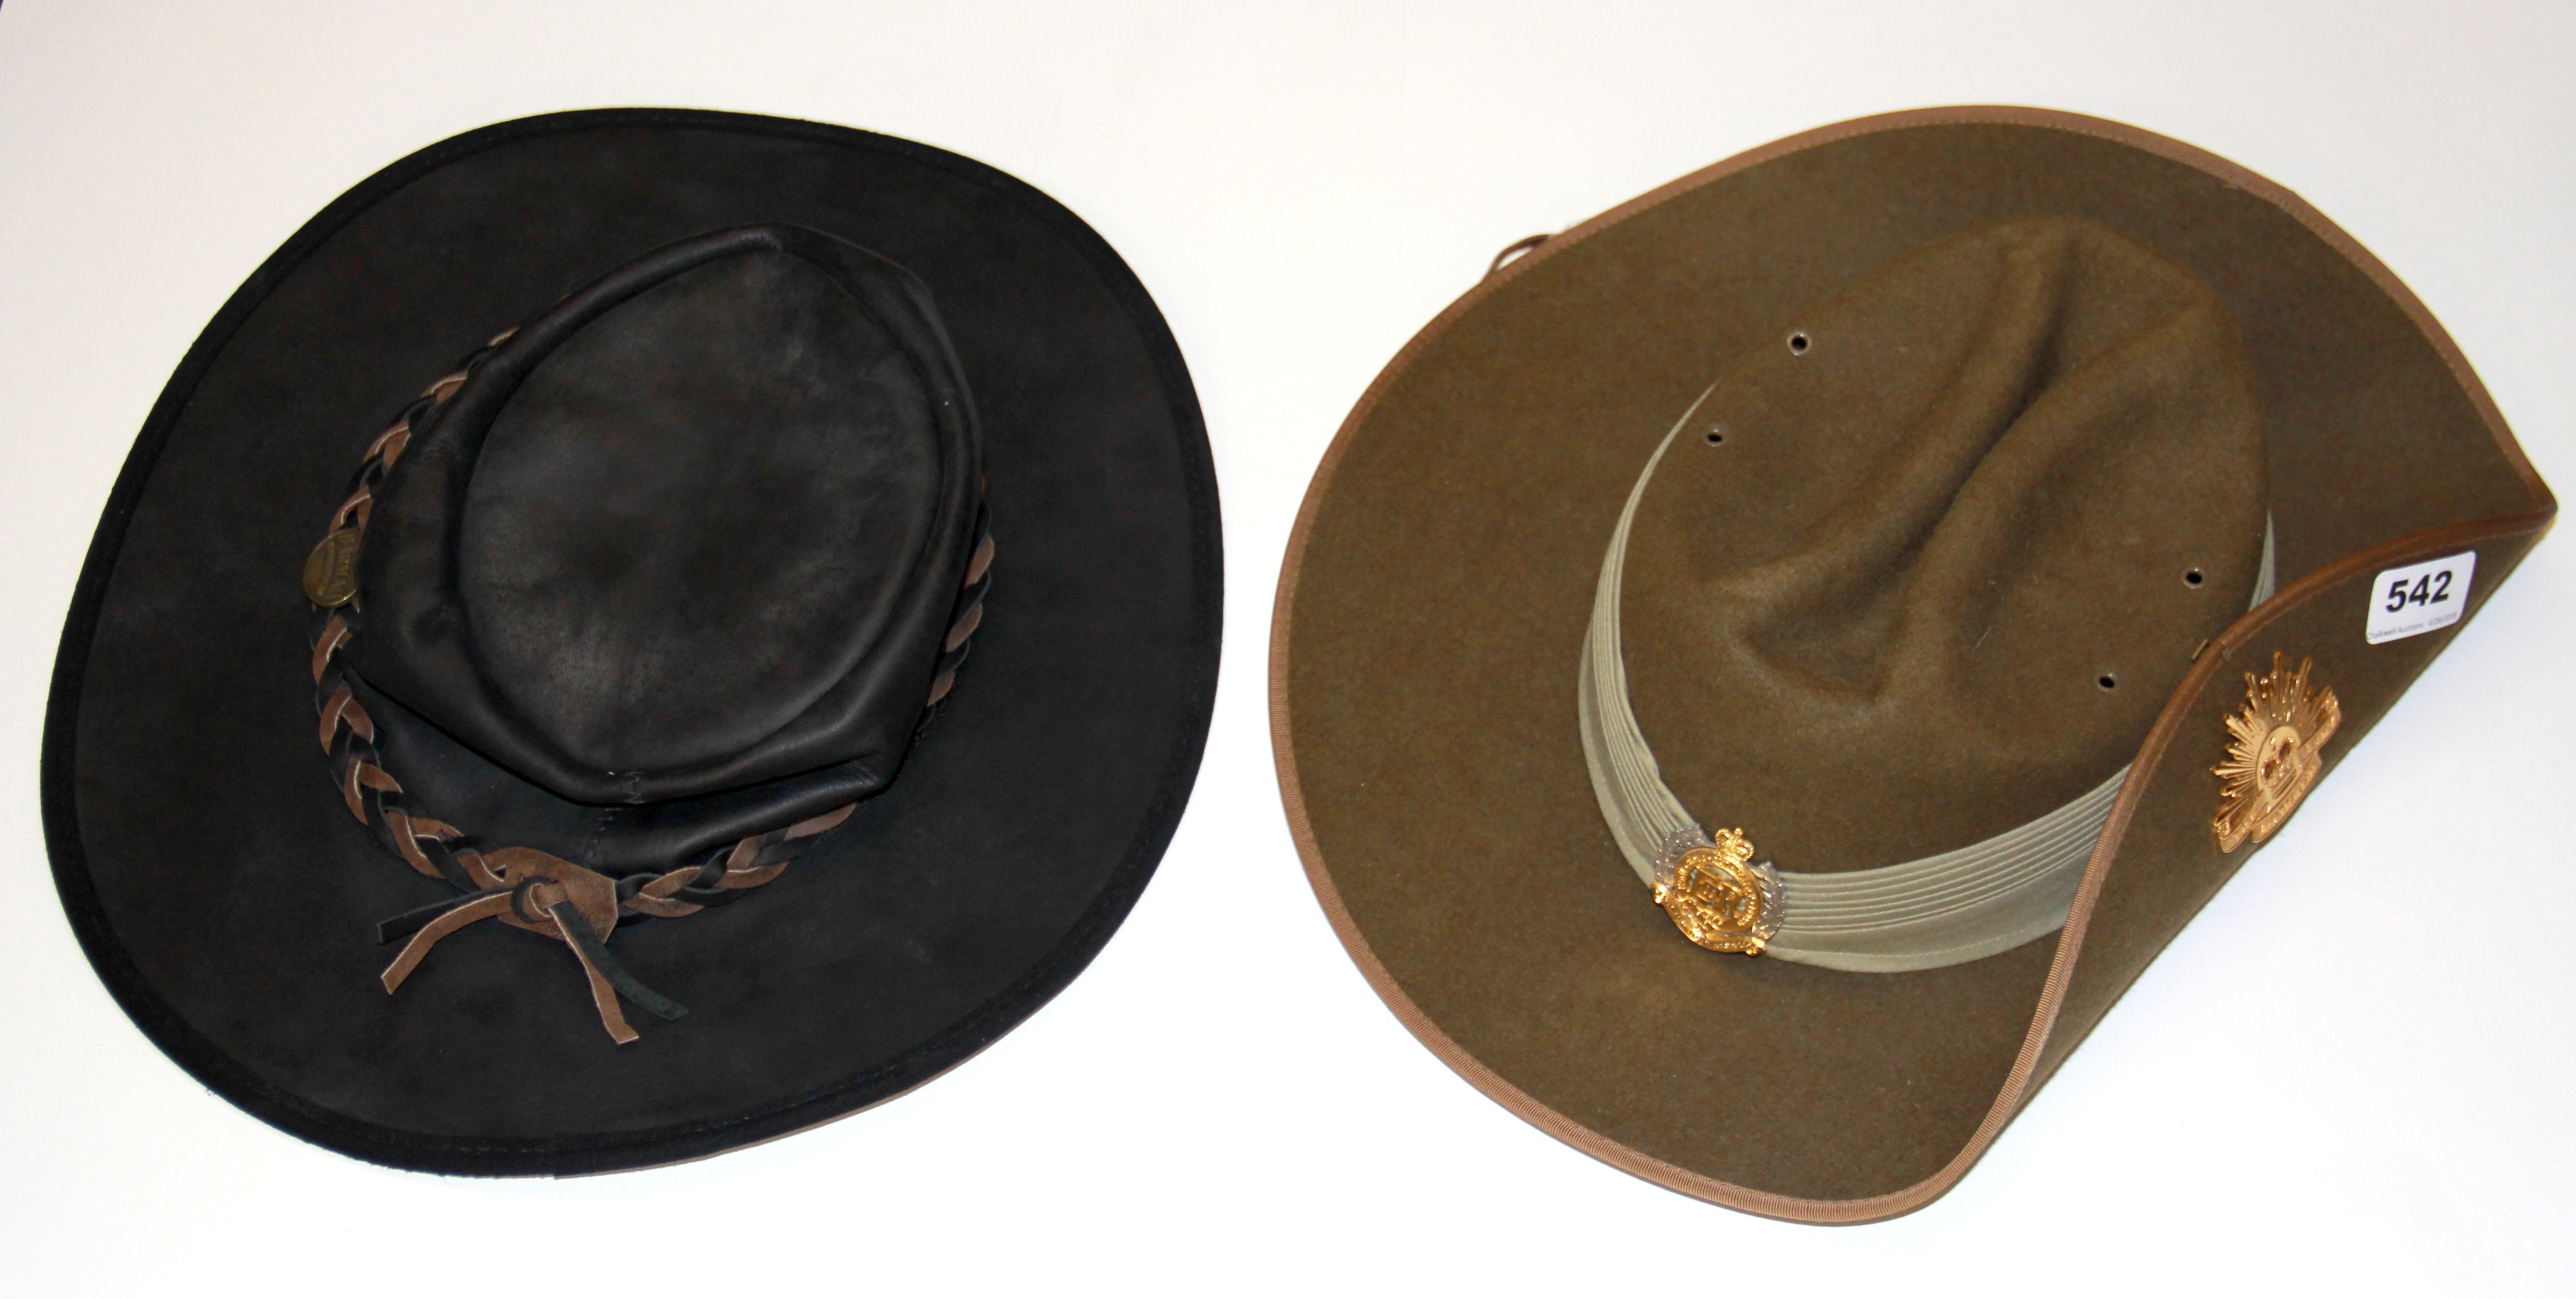 8cb30012c67e3 An australian army bush hat and an australian barmah collapsible leath  lofty marketplace JPG 1000x504 Australian